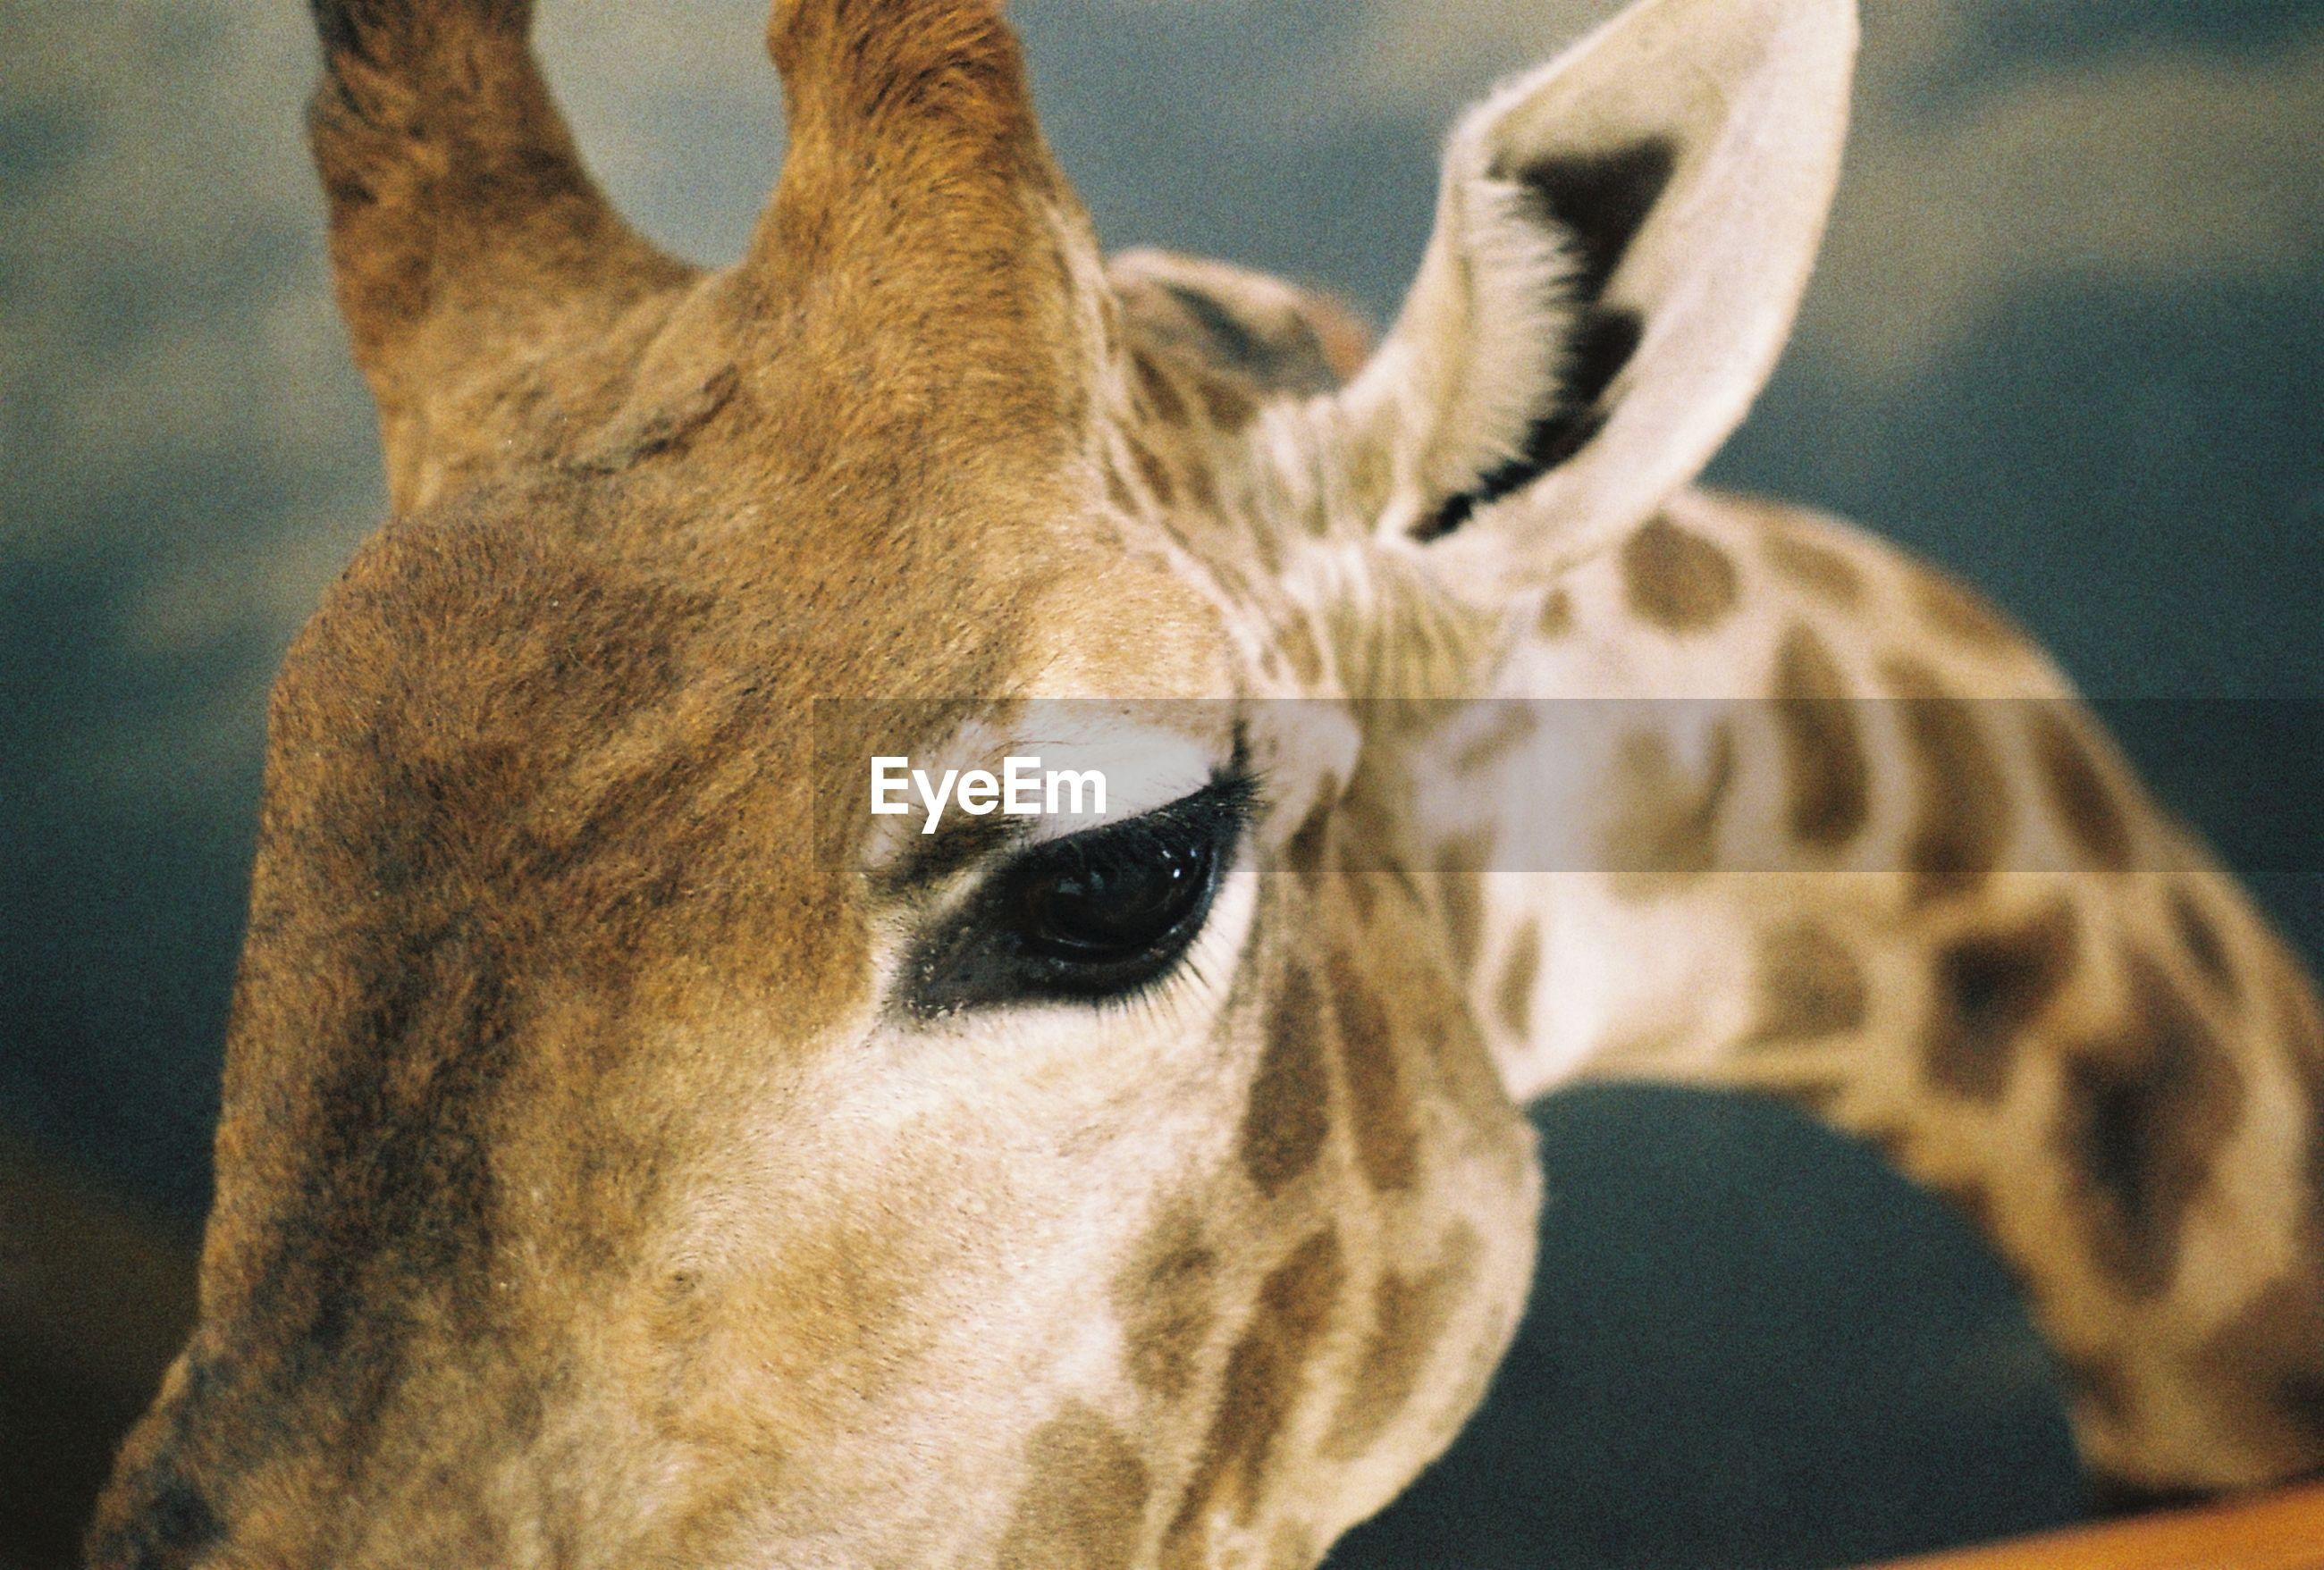 Close-up portrait of giraffe